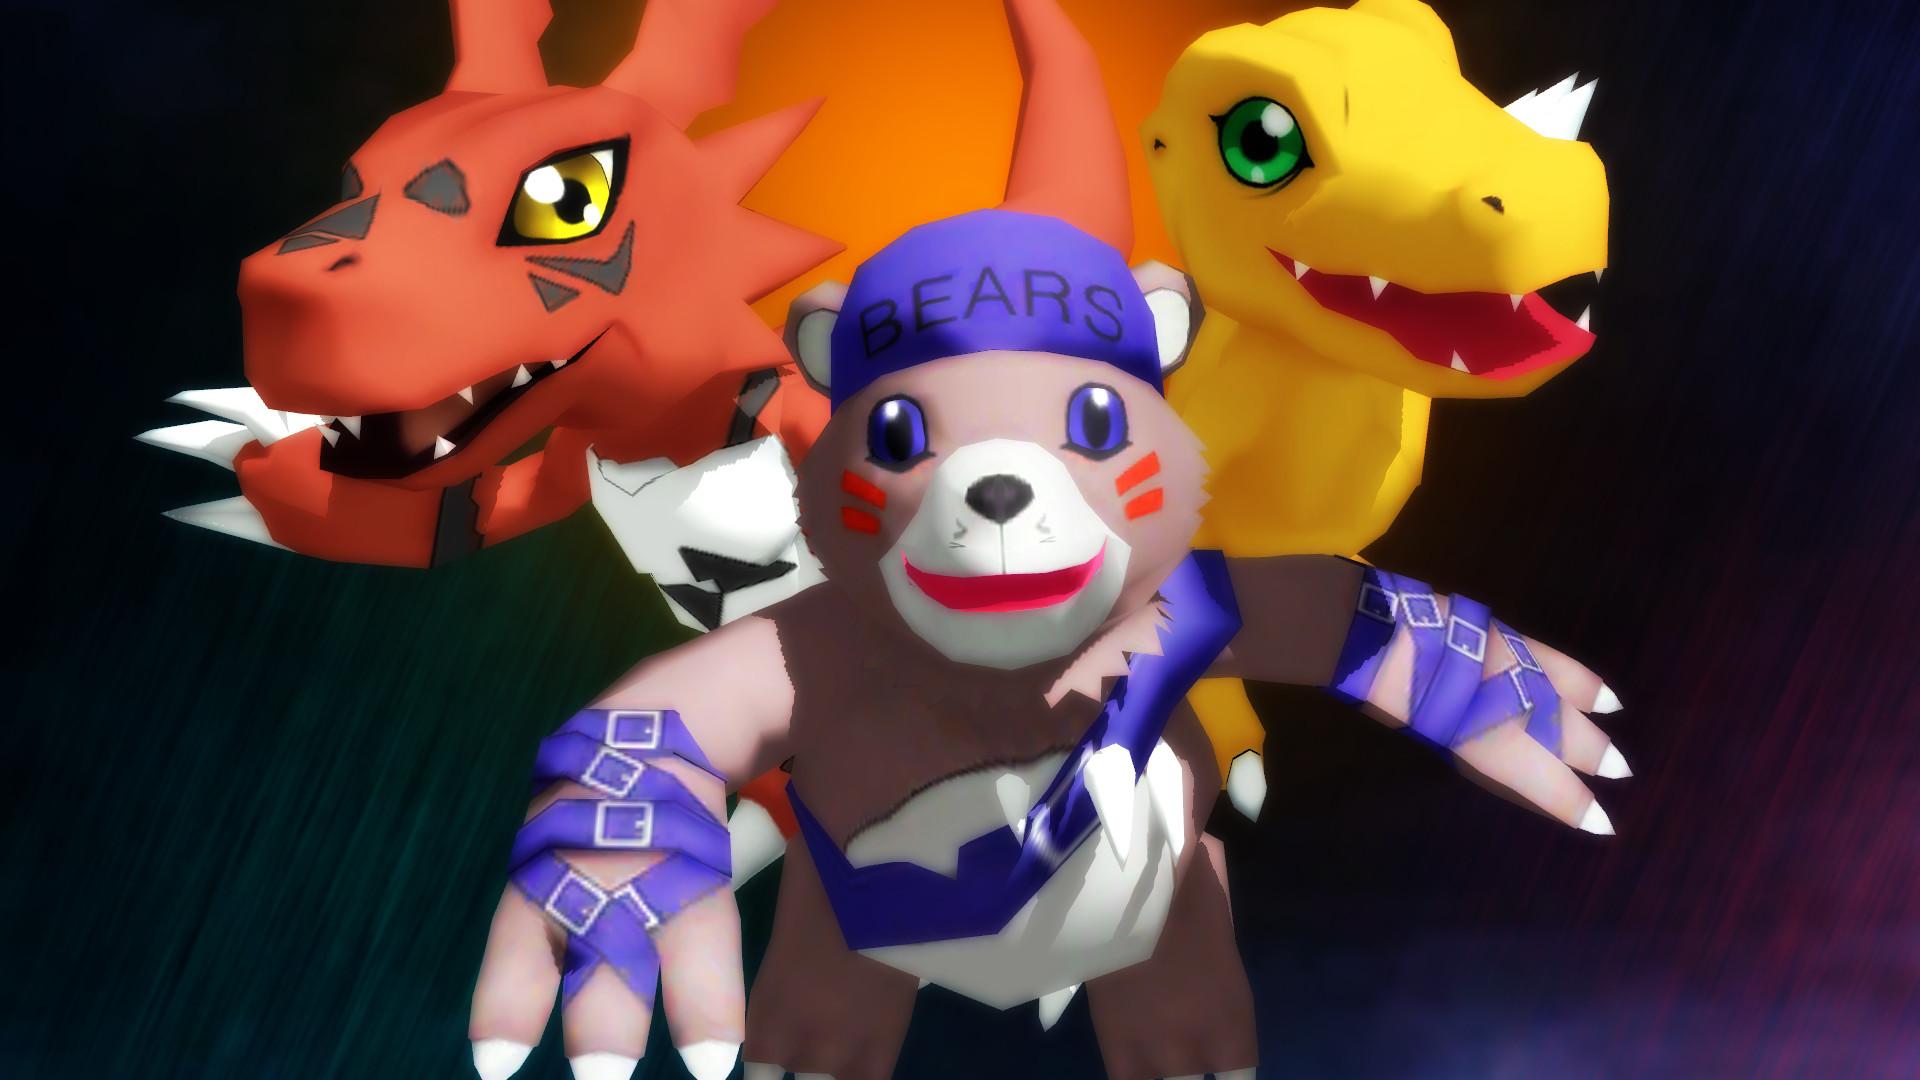 Res: 1920x1080, Digimon World 3 by GuilTronPrime Digimon World 3 by GuilTronPrime